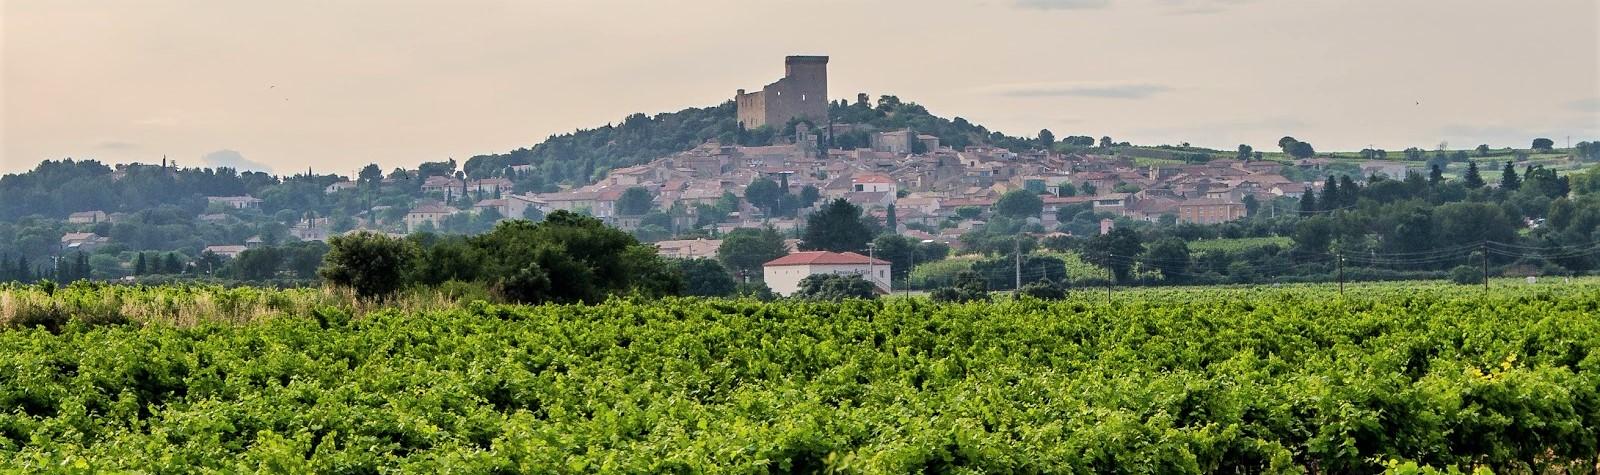 CdP vineyards (2)